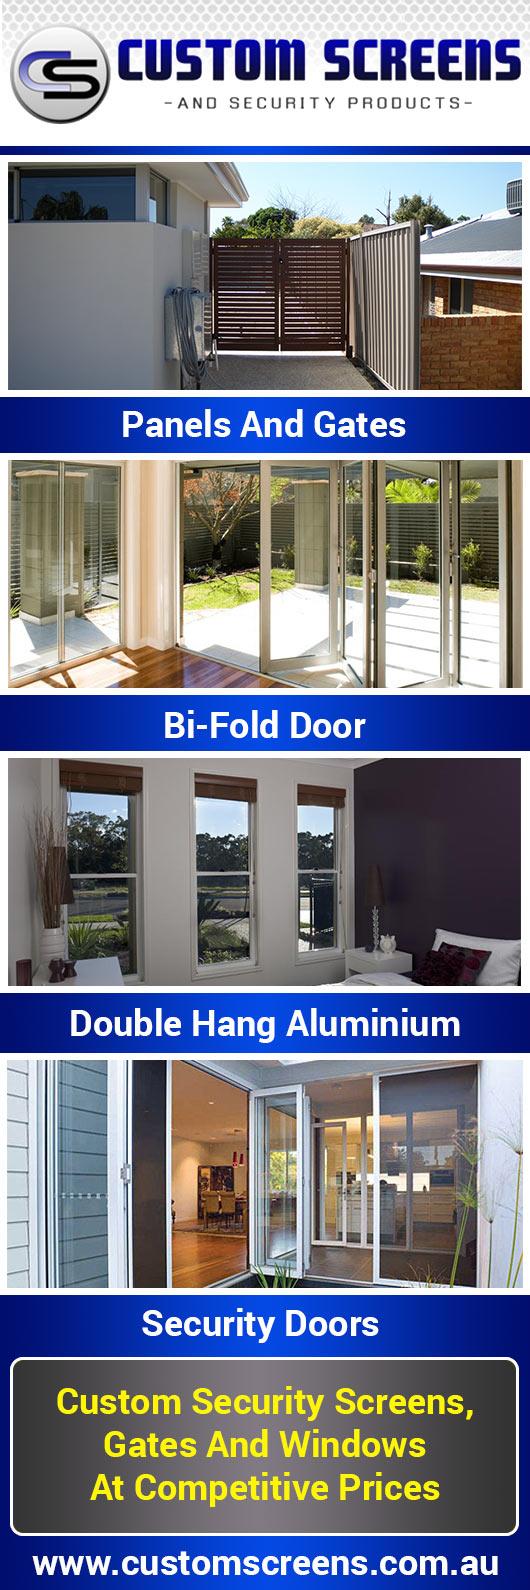 Custom Screens And Security Products Doors Door Fittings Beechboro